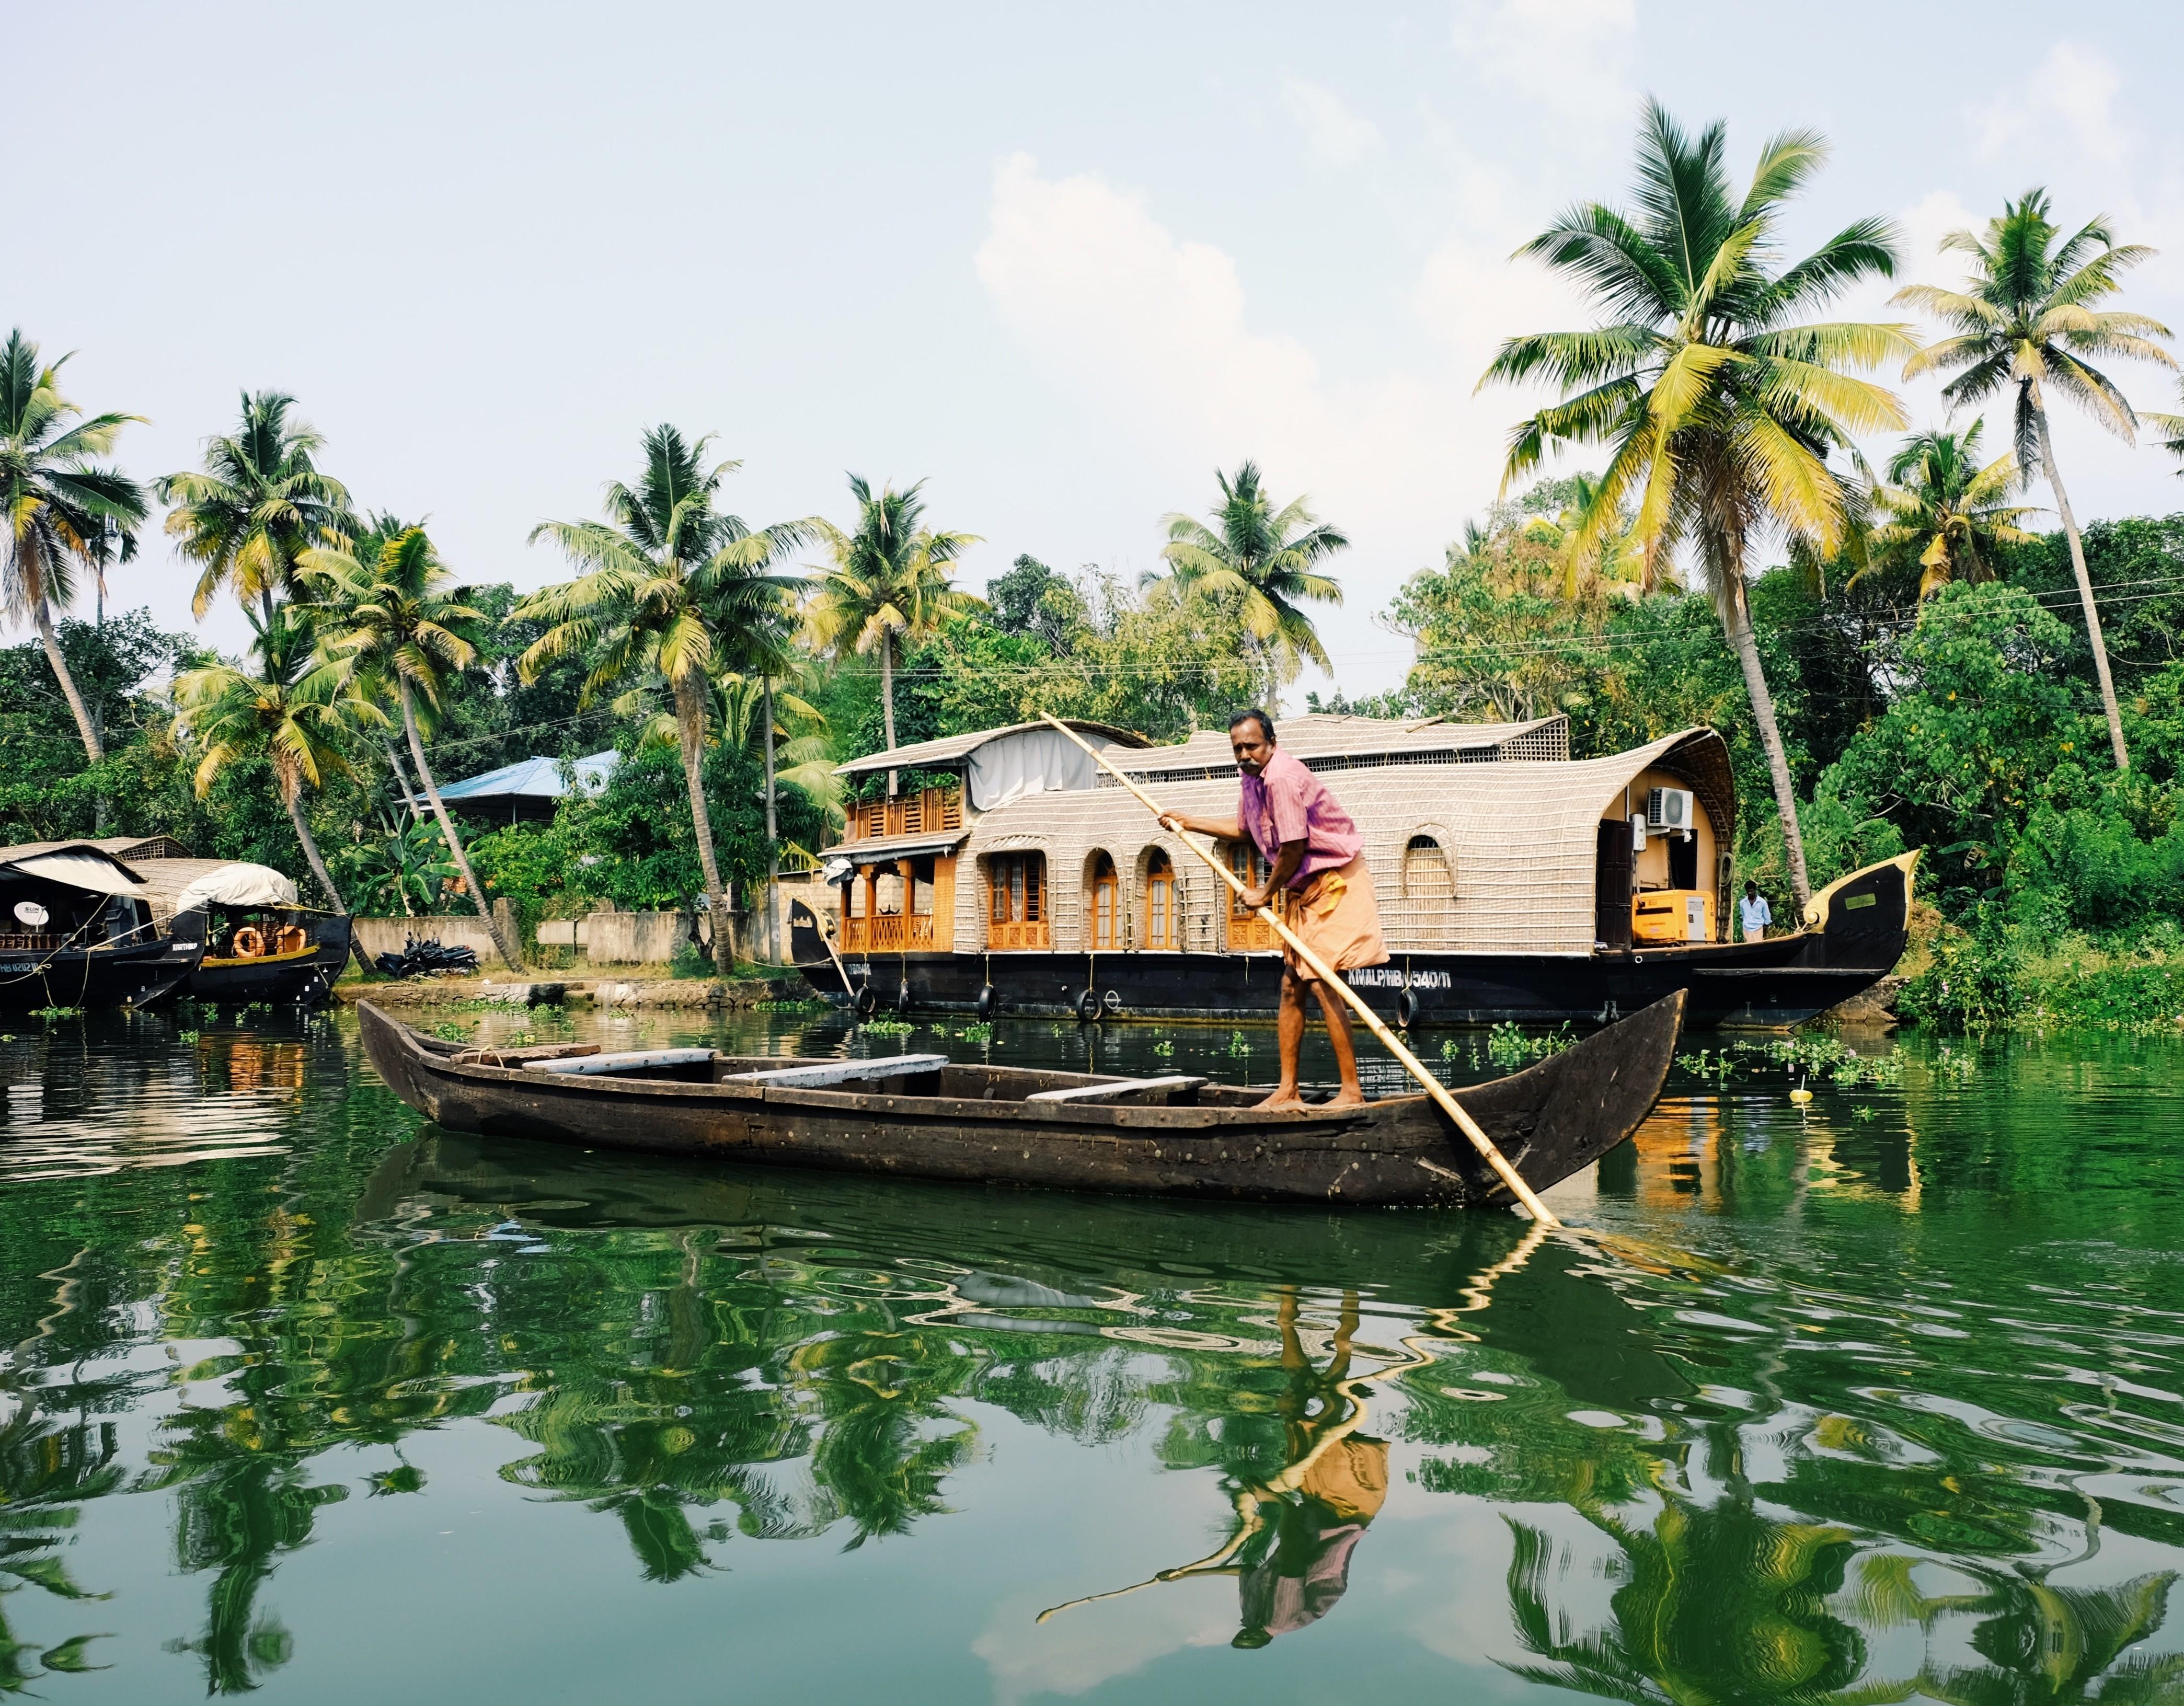 Photo La nuit en house boat - Inde